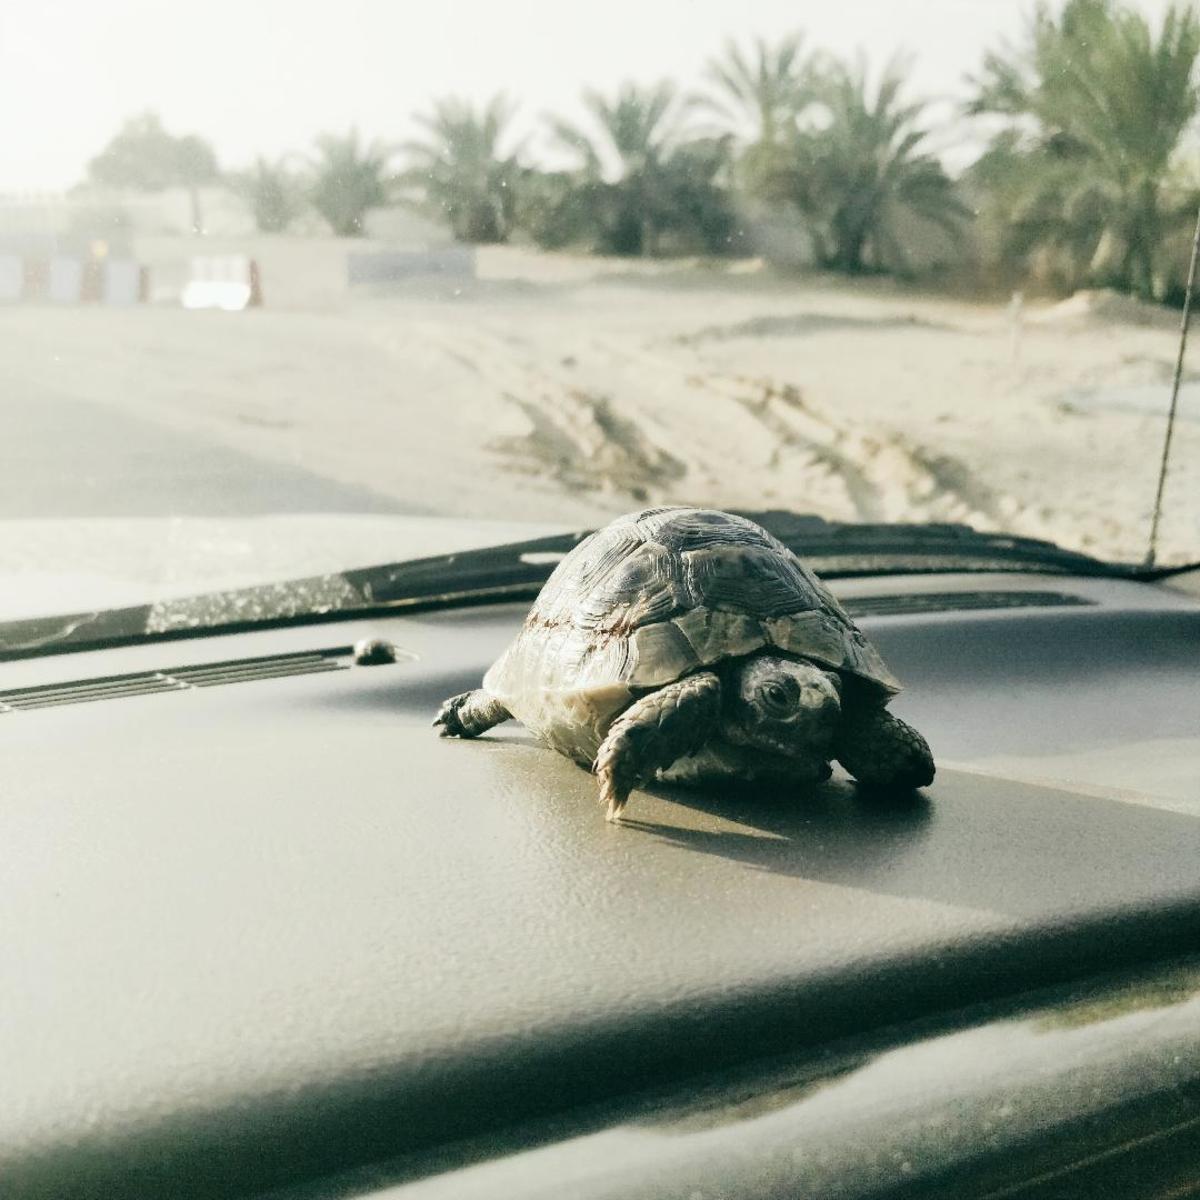 Bringing Home a Greek Tortoise (Spur-Thighed)